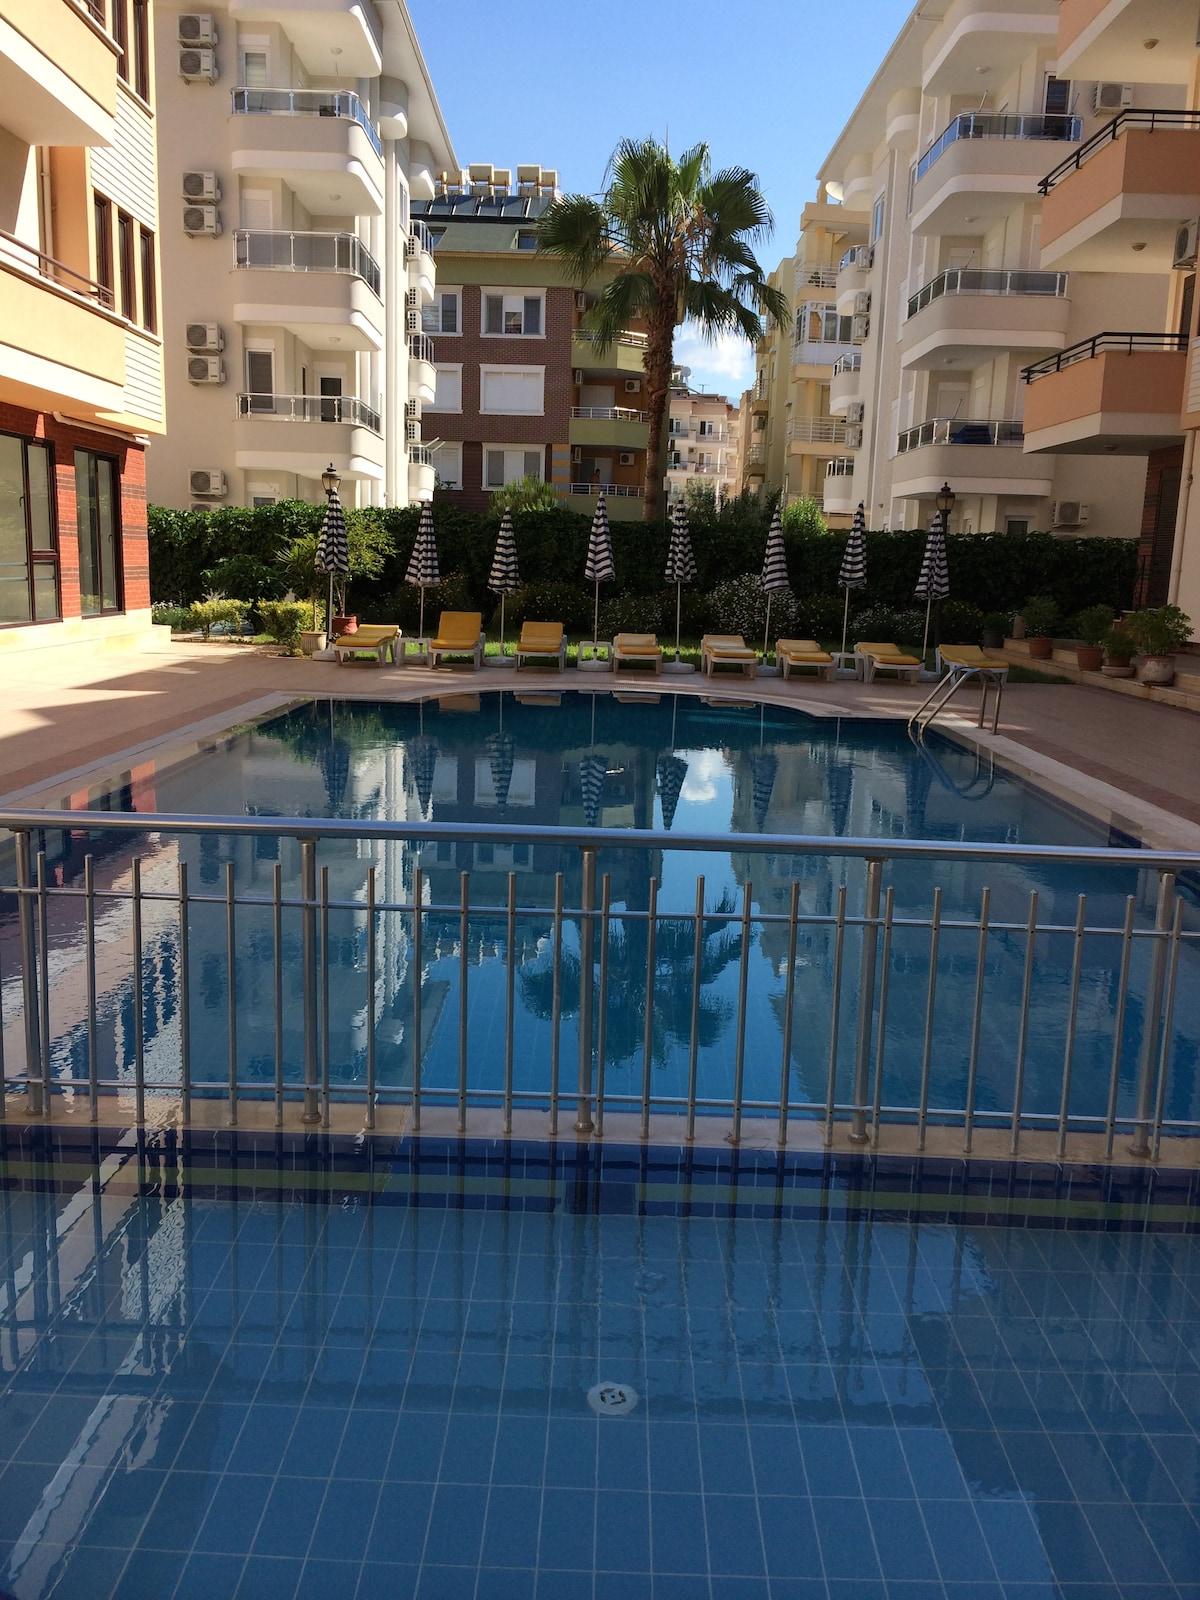 Oba Konak Apartments